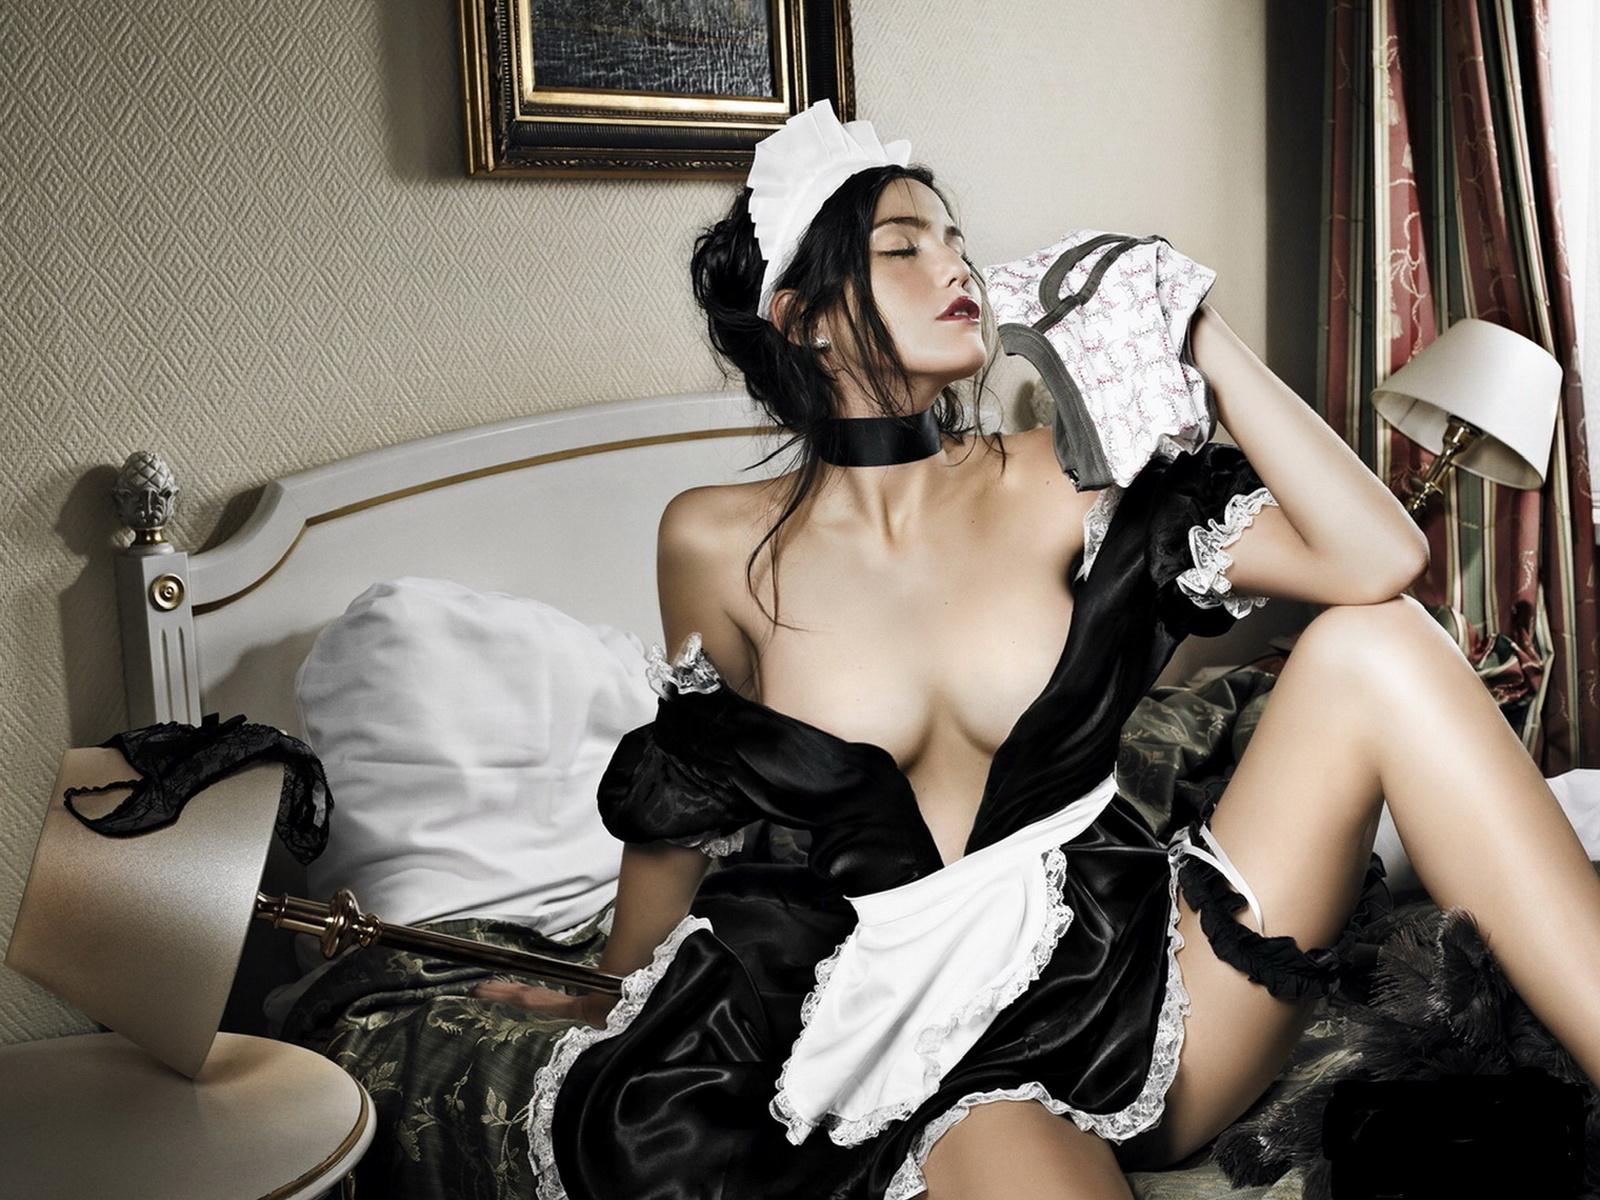 Sexy maid nude hints